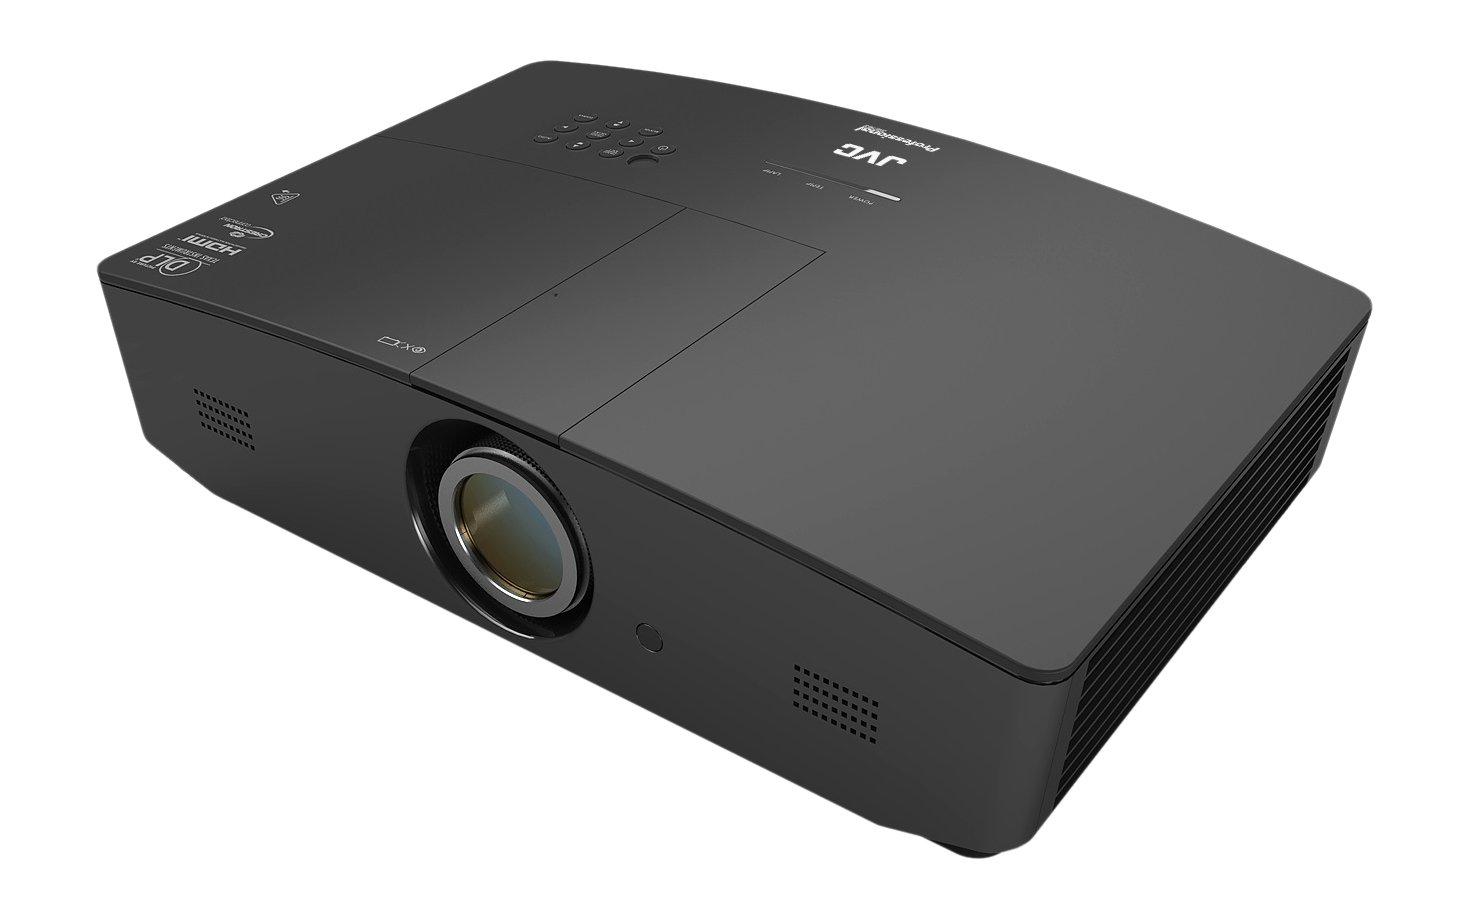 Jvc Projector Professional Series Dlp 3d Ready 5000 Lumens